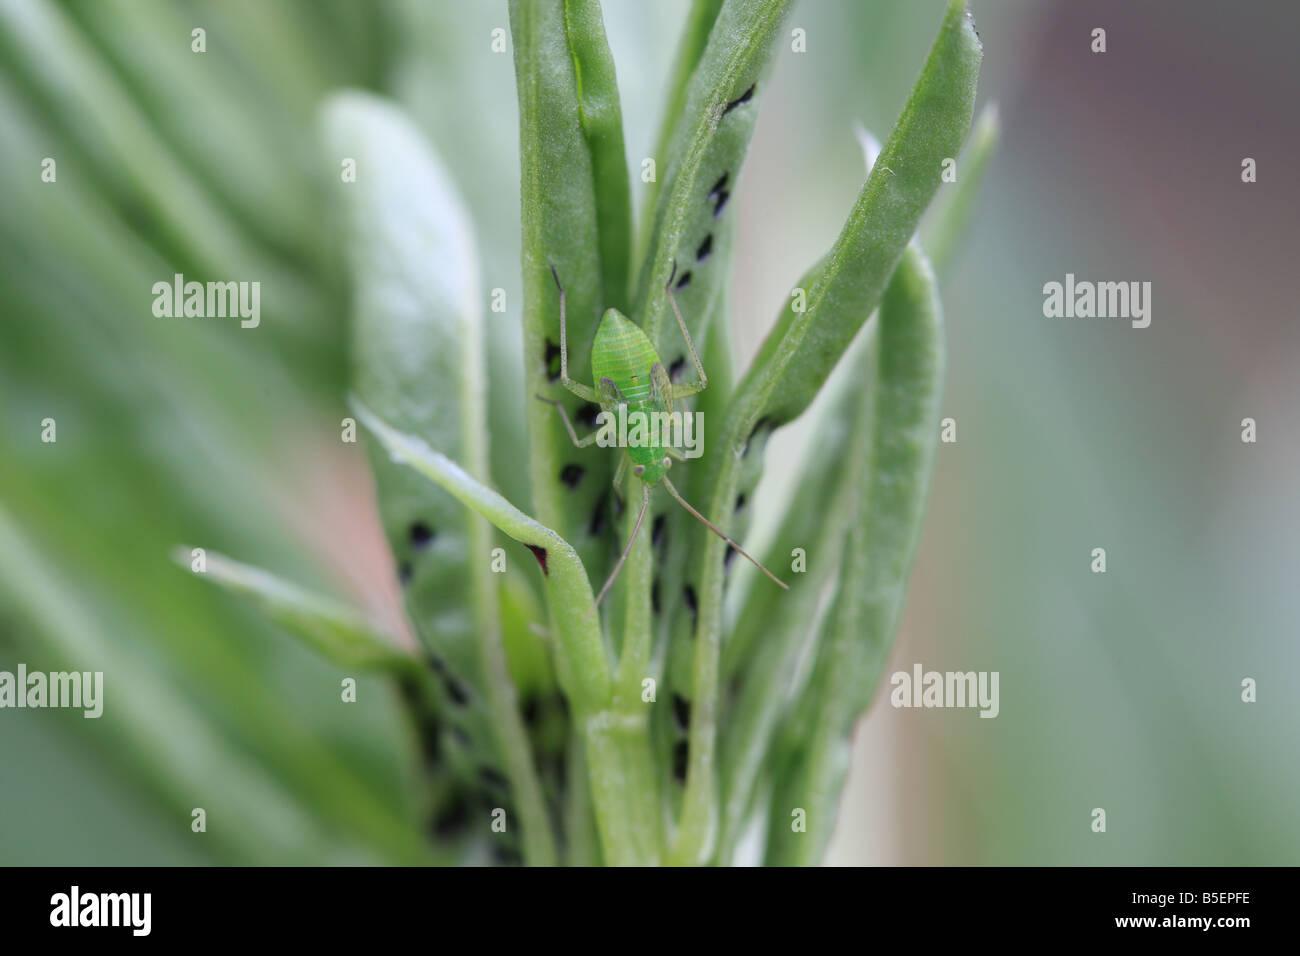 COMMON GREEN CAPSID Lygocoris pabulinus NYMPH ON BROAD BEAN SHOOT BACK VIEW - Stock Image